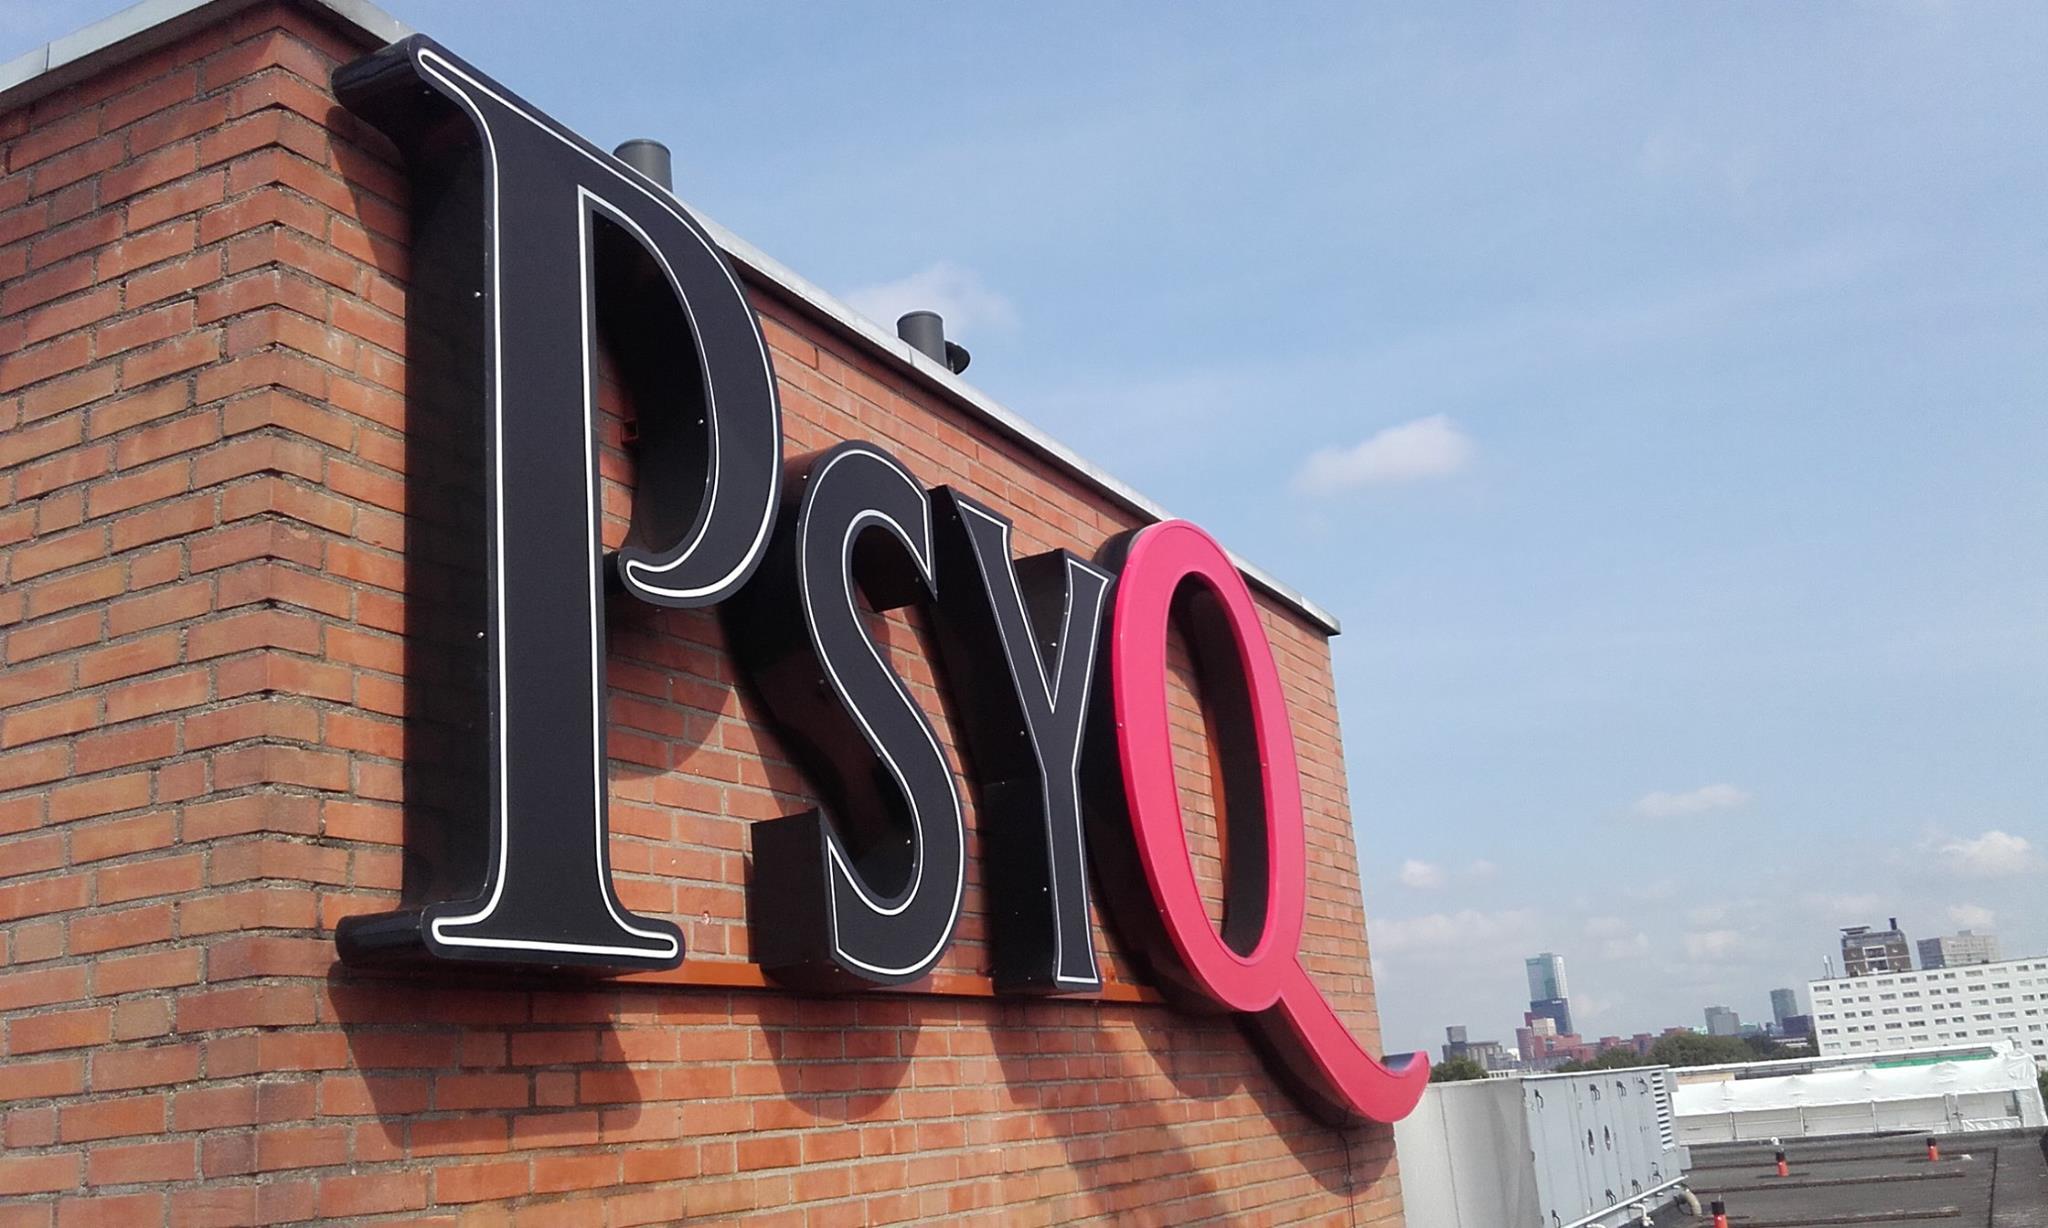 PsyQ Rotterdam